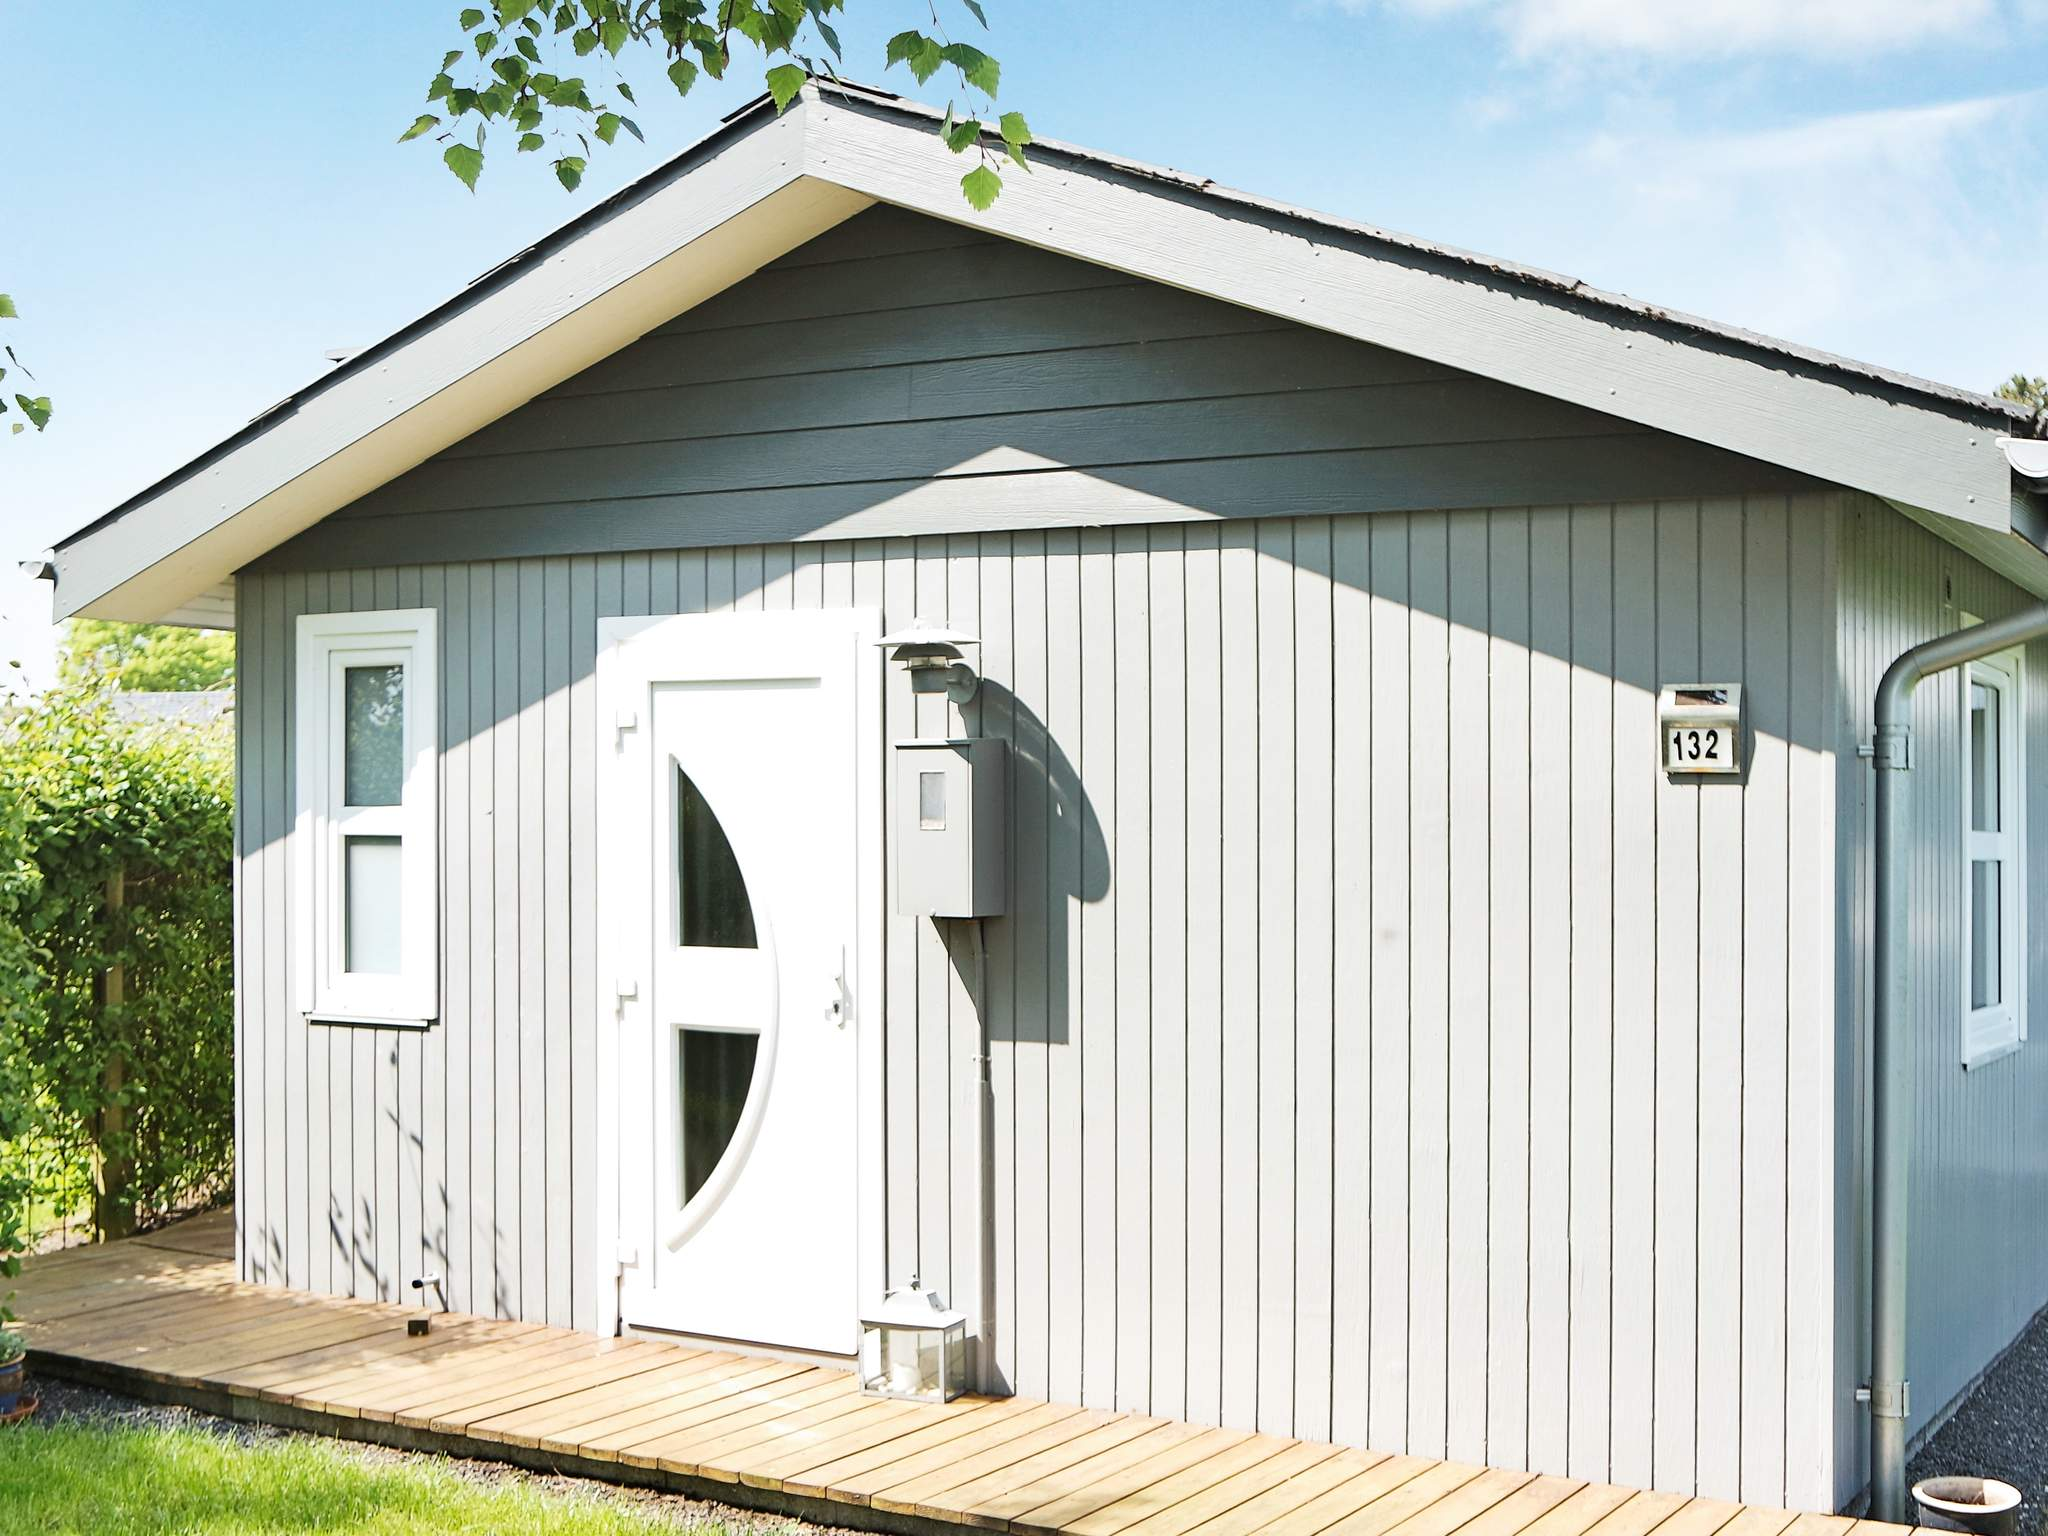 Ferienhaus Øster Hurup (85519), Øster Hurup, , Dänische Ostsee, Dänemark, Bild 13